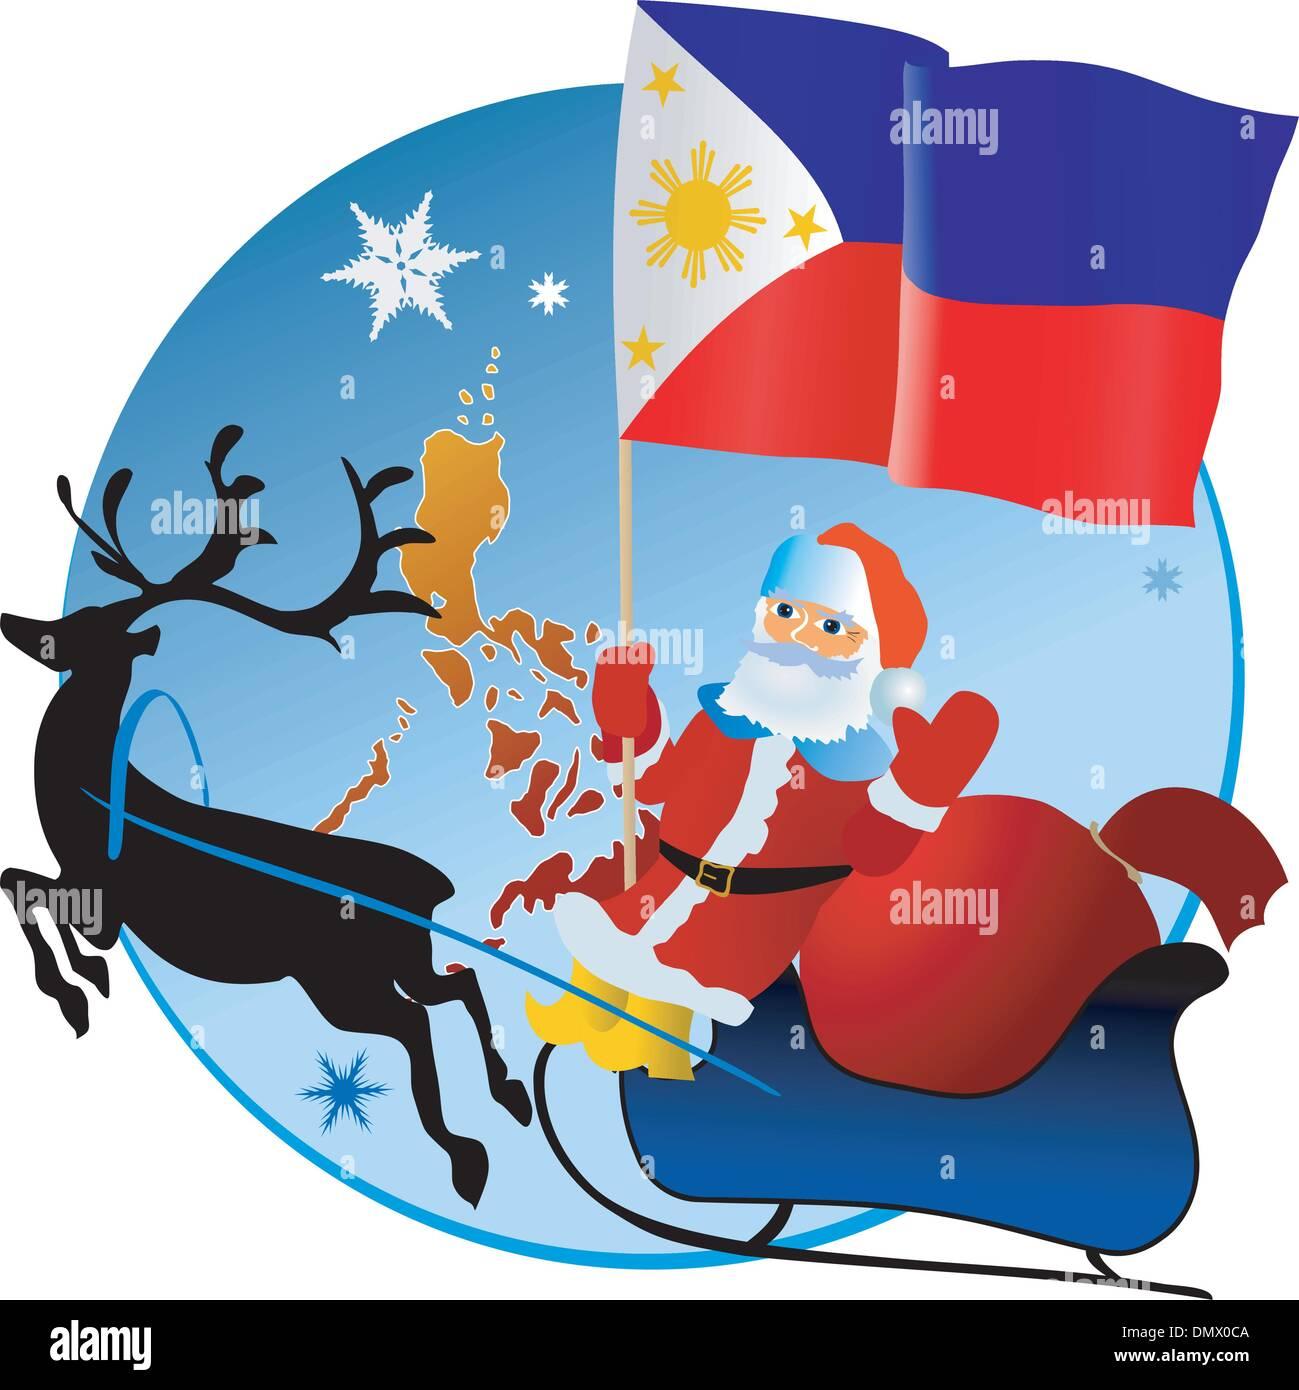 Merry Christmas In Filipino.Merry Christmas Philippines Stock Vector Art